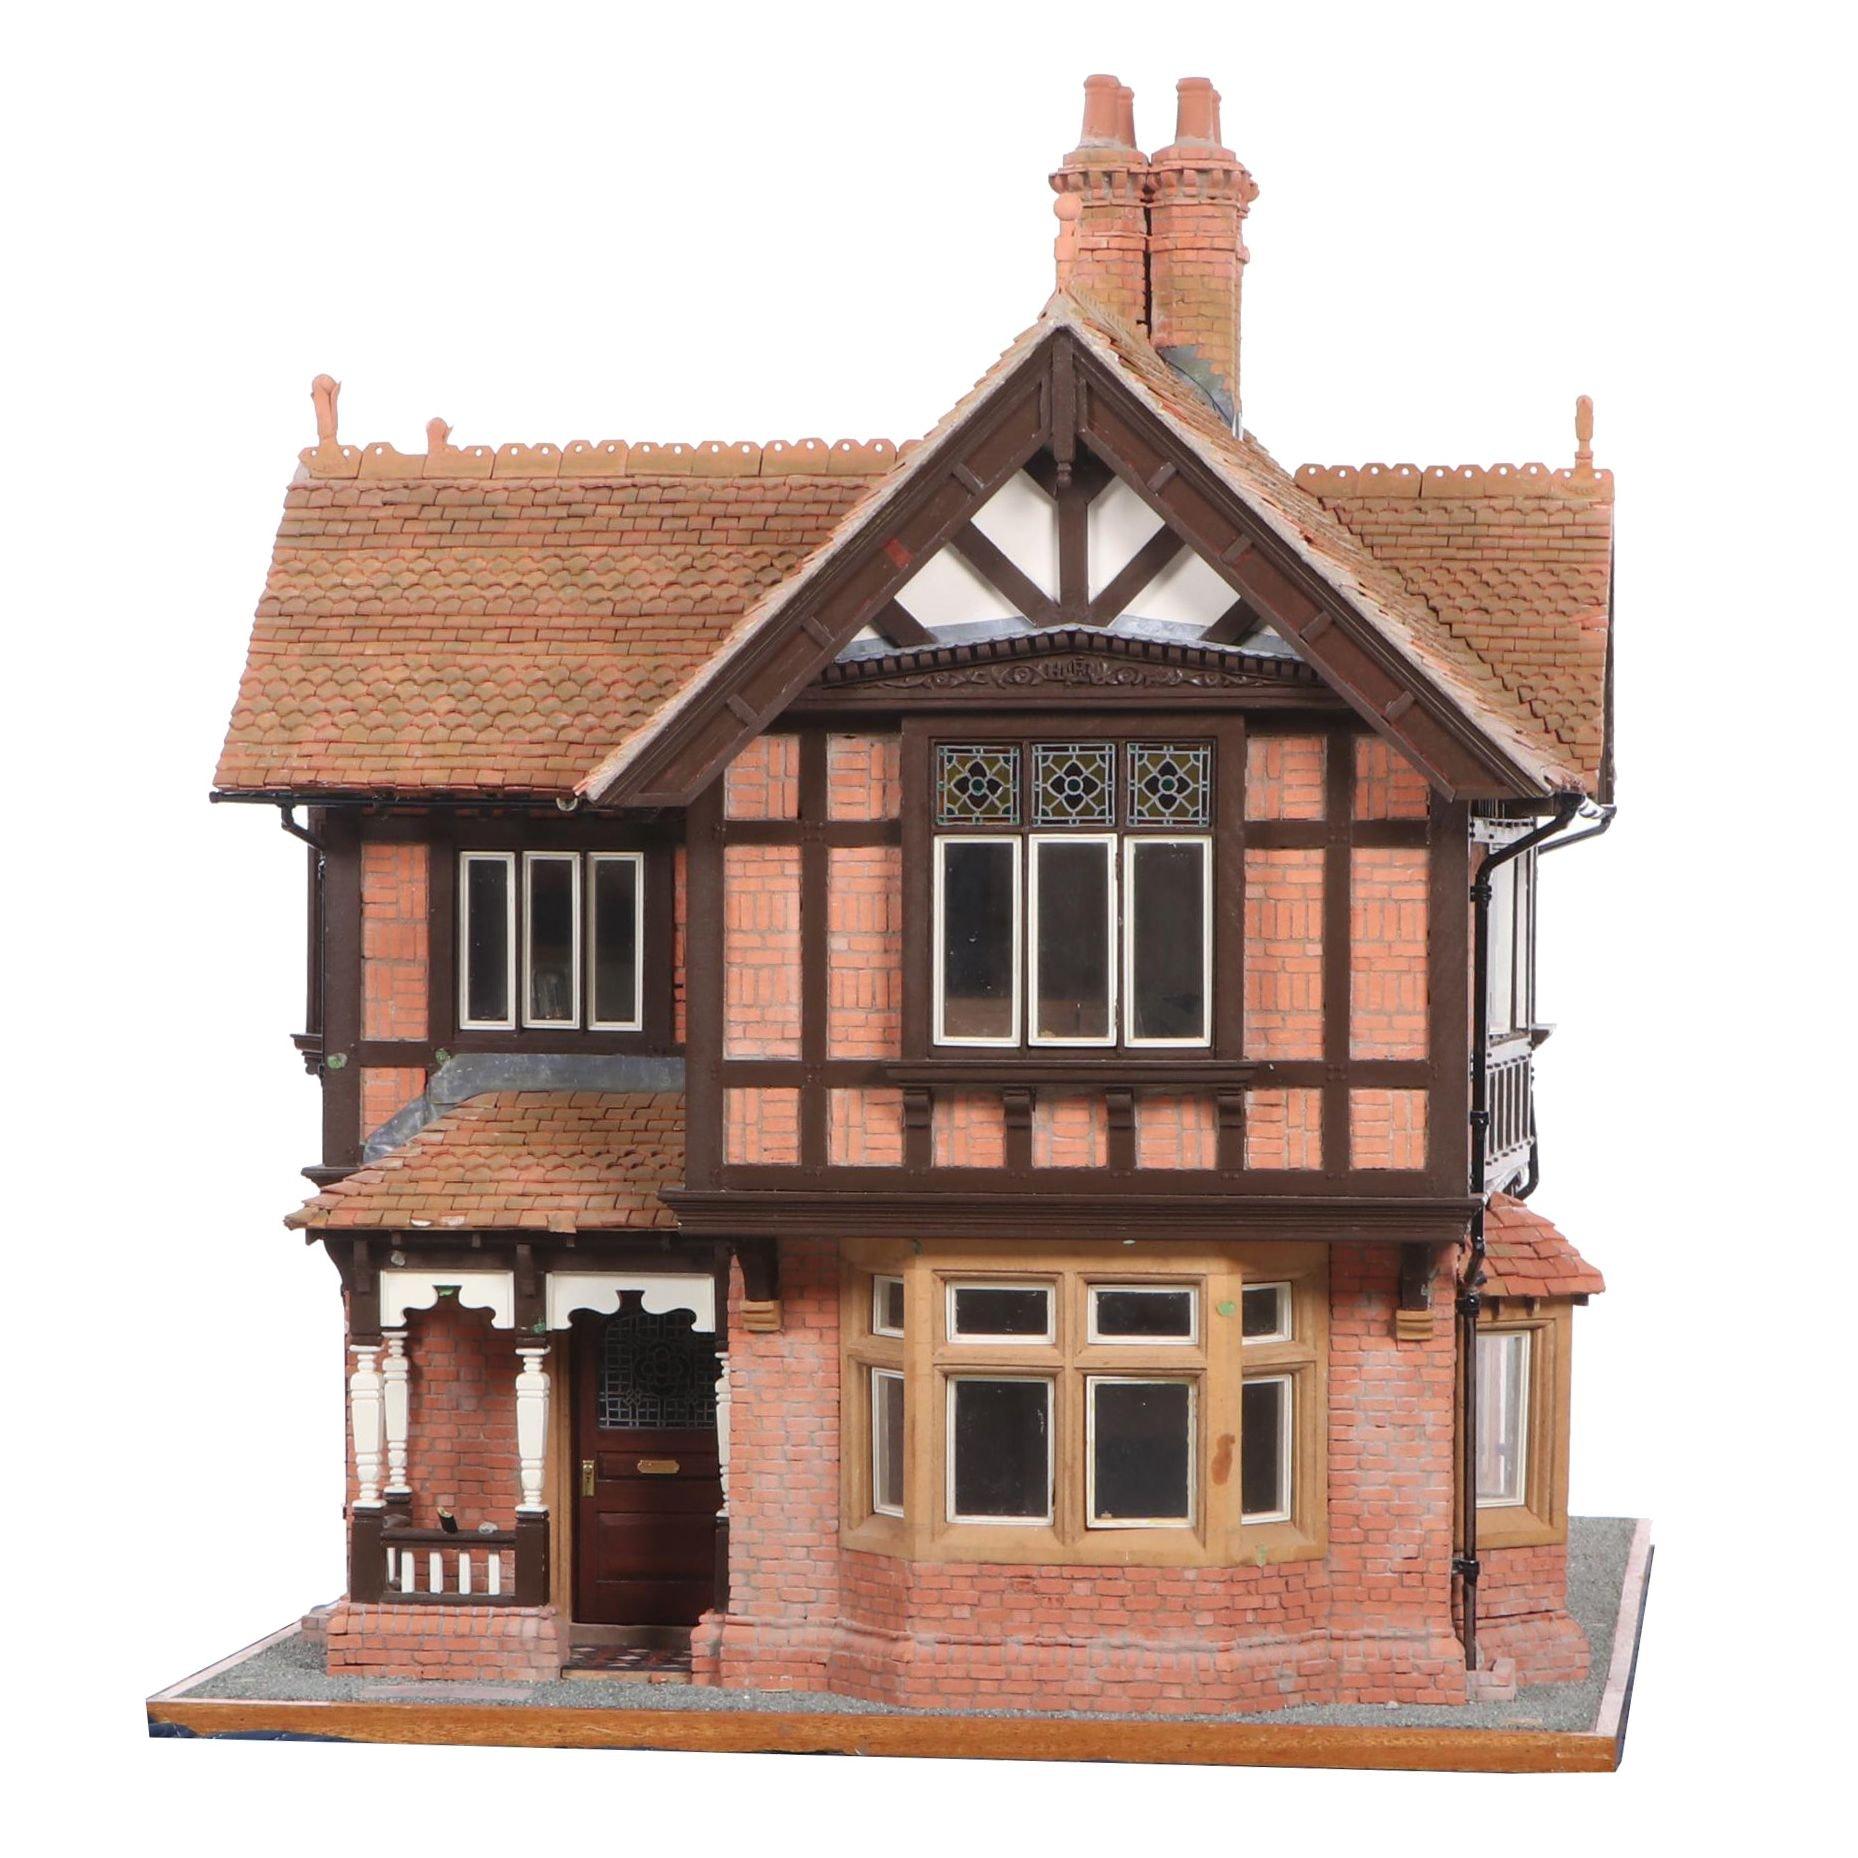 John McColgan Miniature after The Grove Lodge Craven Arms, Shropshire, 1992